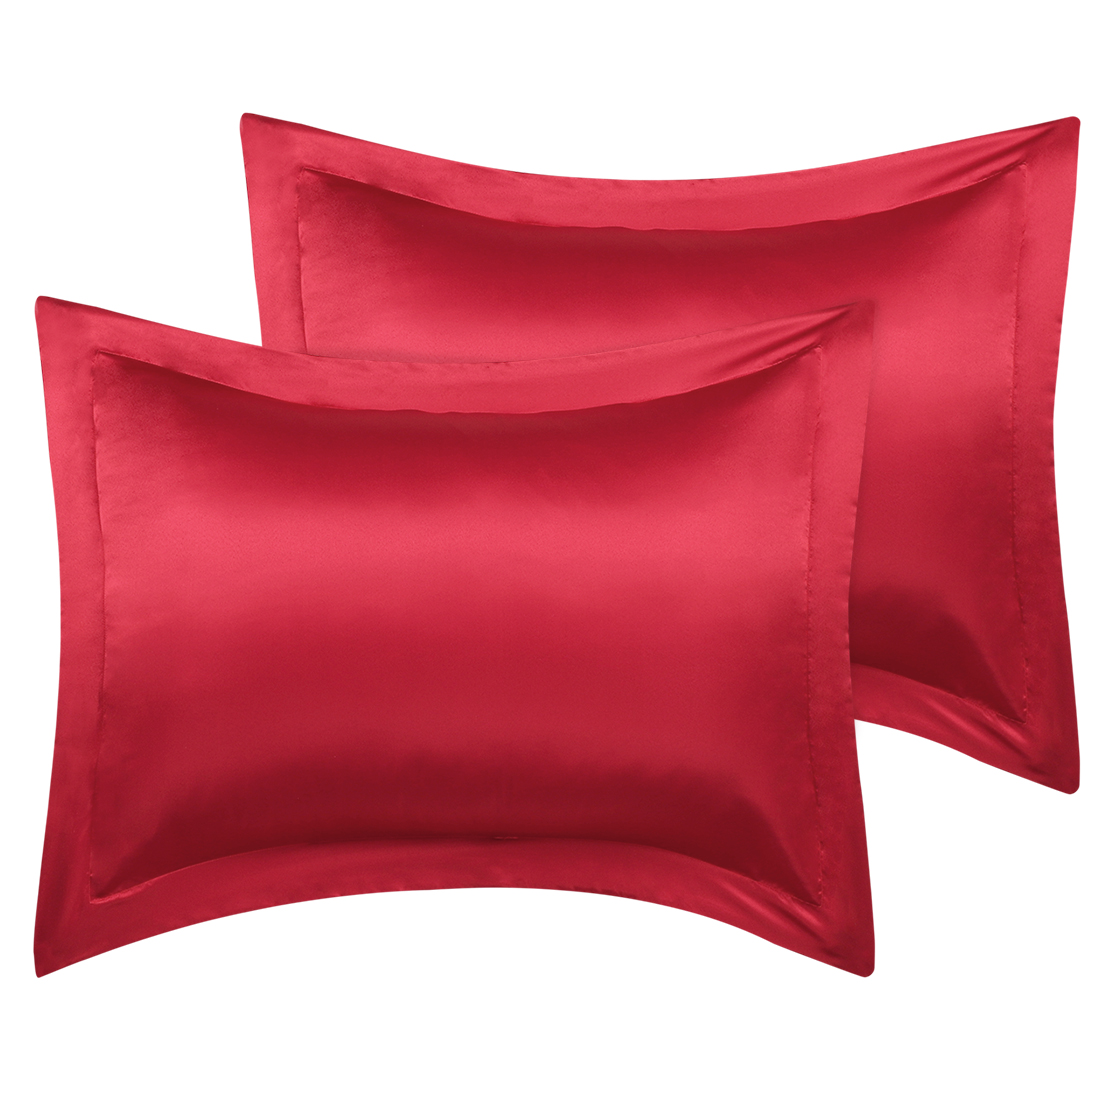 2 Pcs Wine Red Pillow Shams Satin Pillow Cases Boudoir Oxford Pillowcases